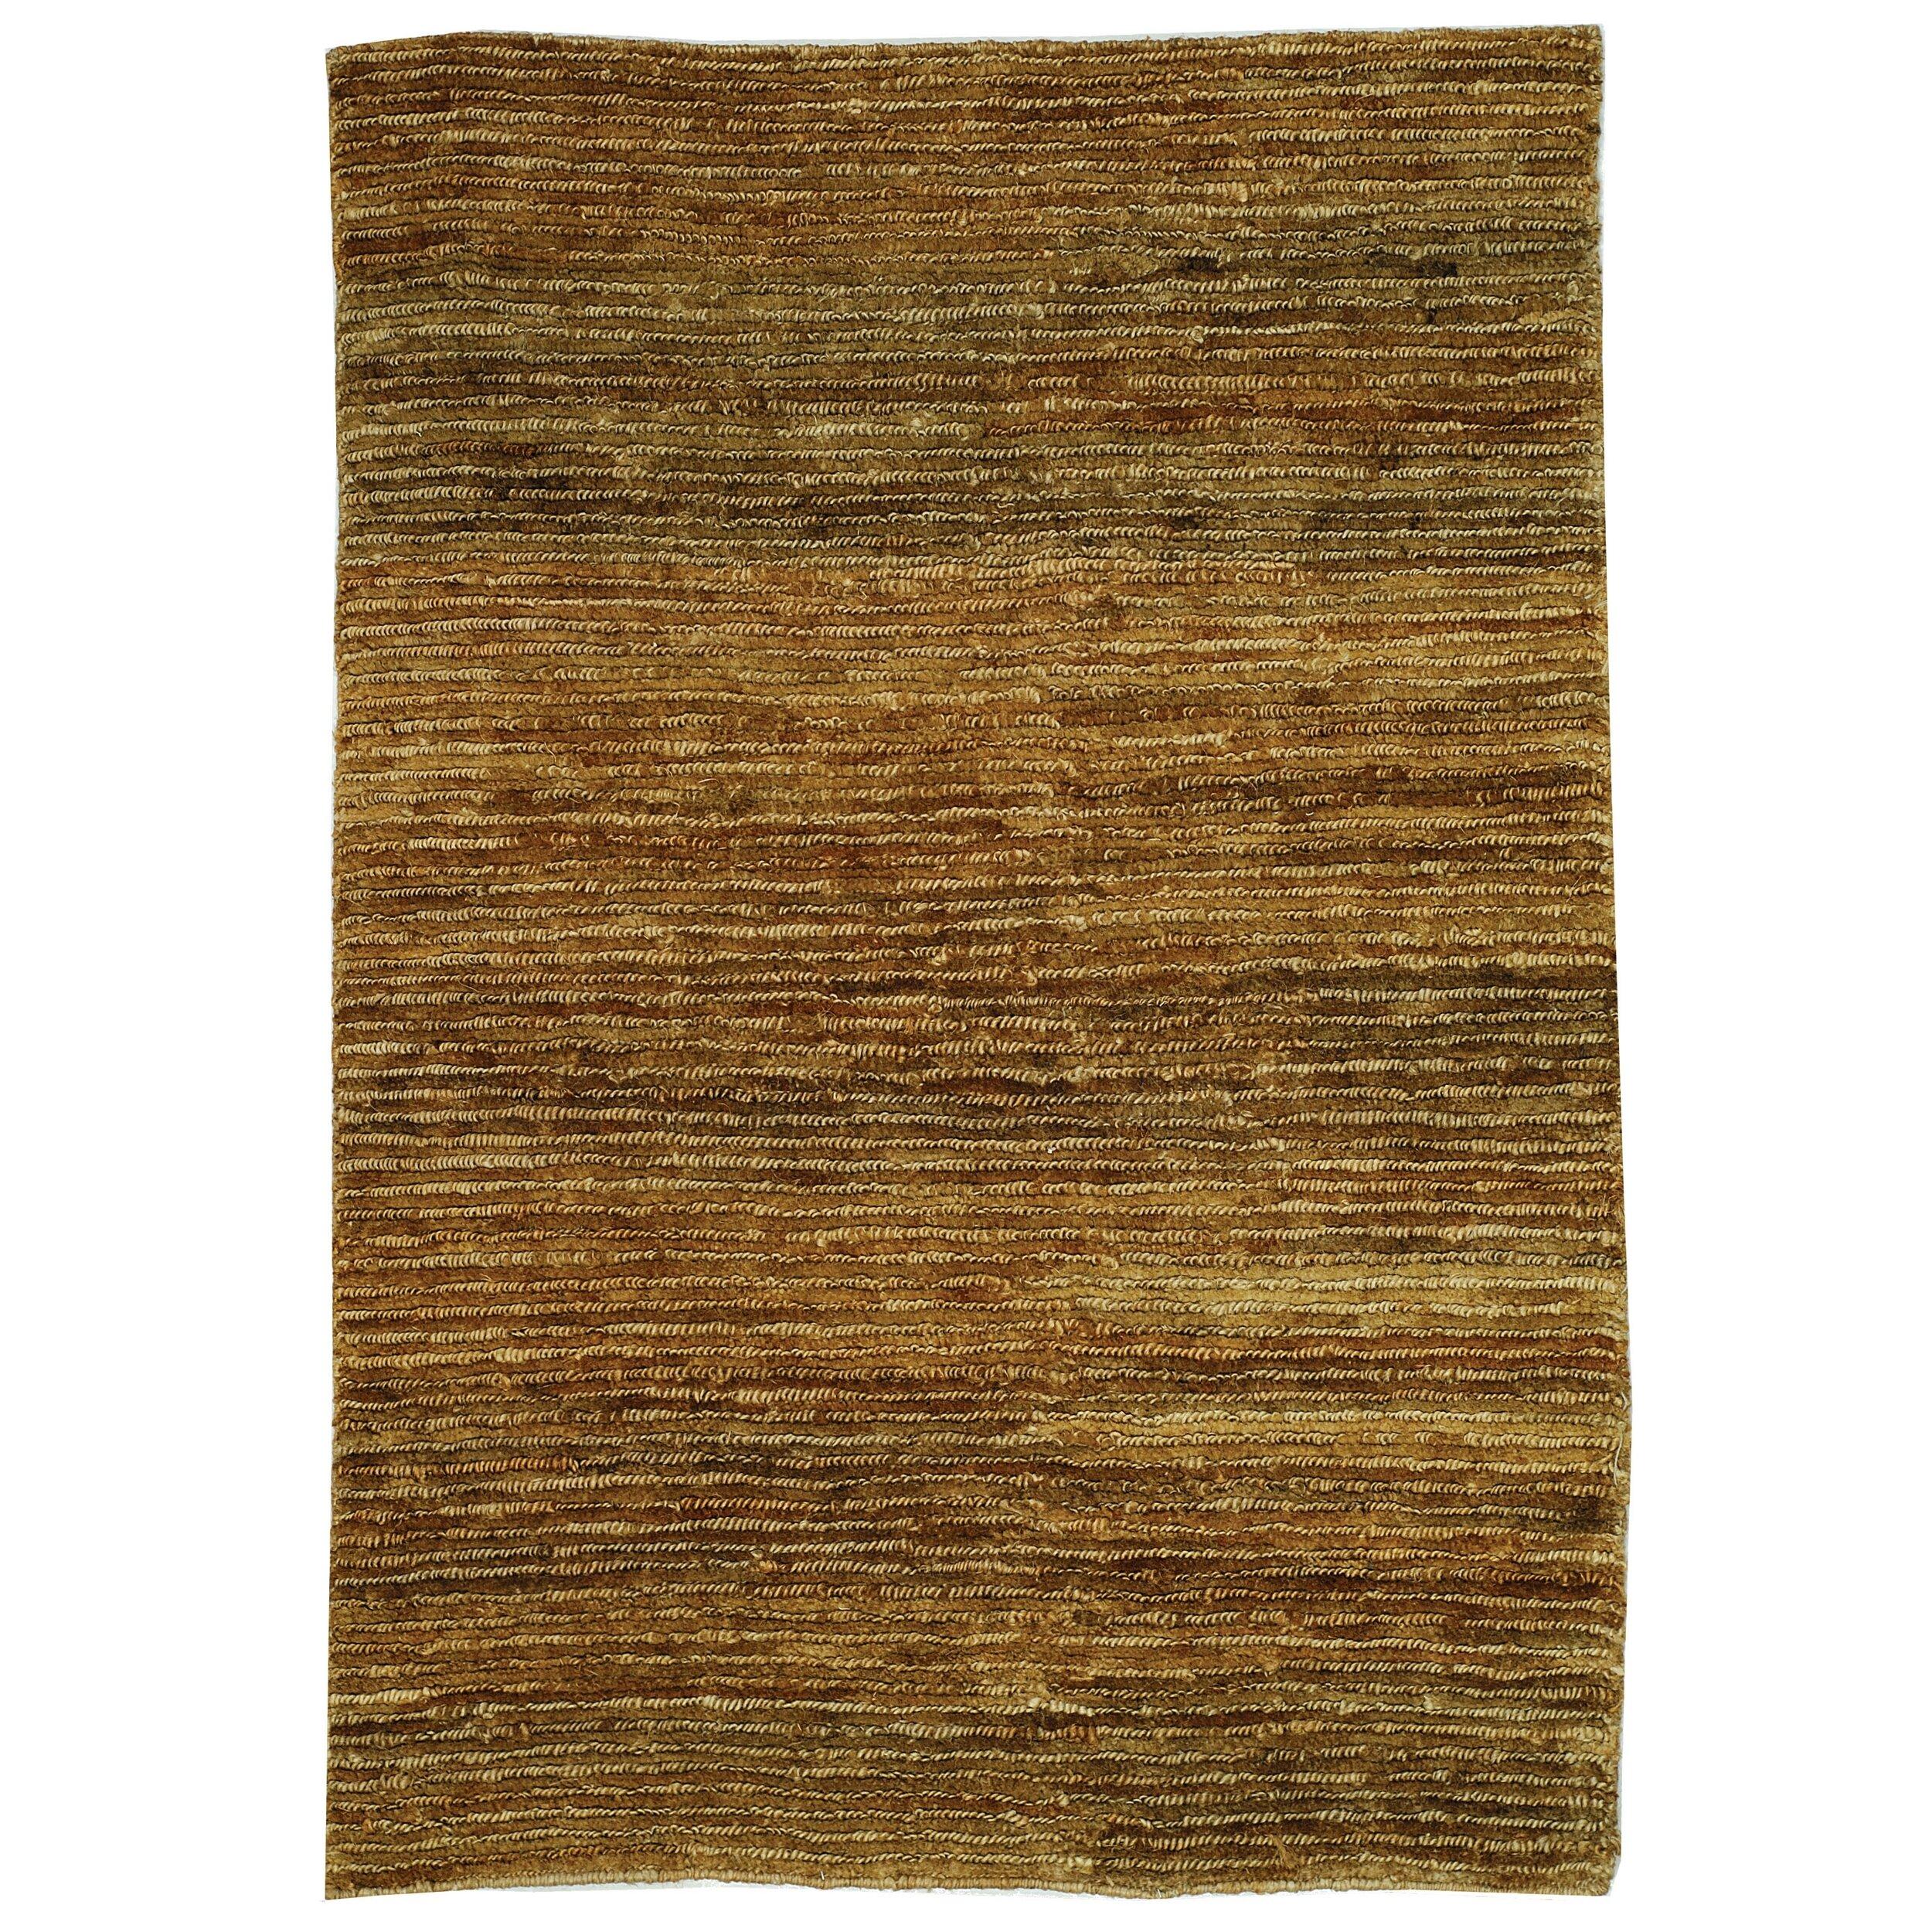 Safavieh organica gold area rug reviews wayfair for Safavieh rugs